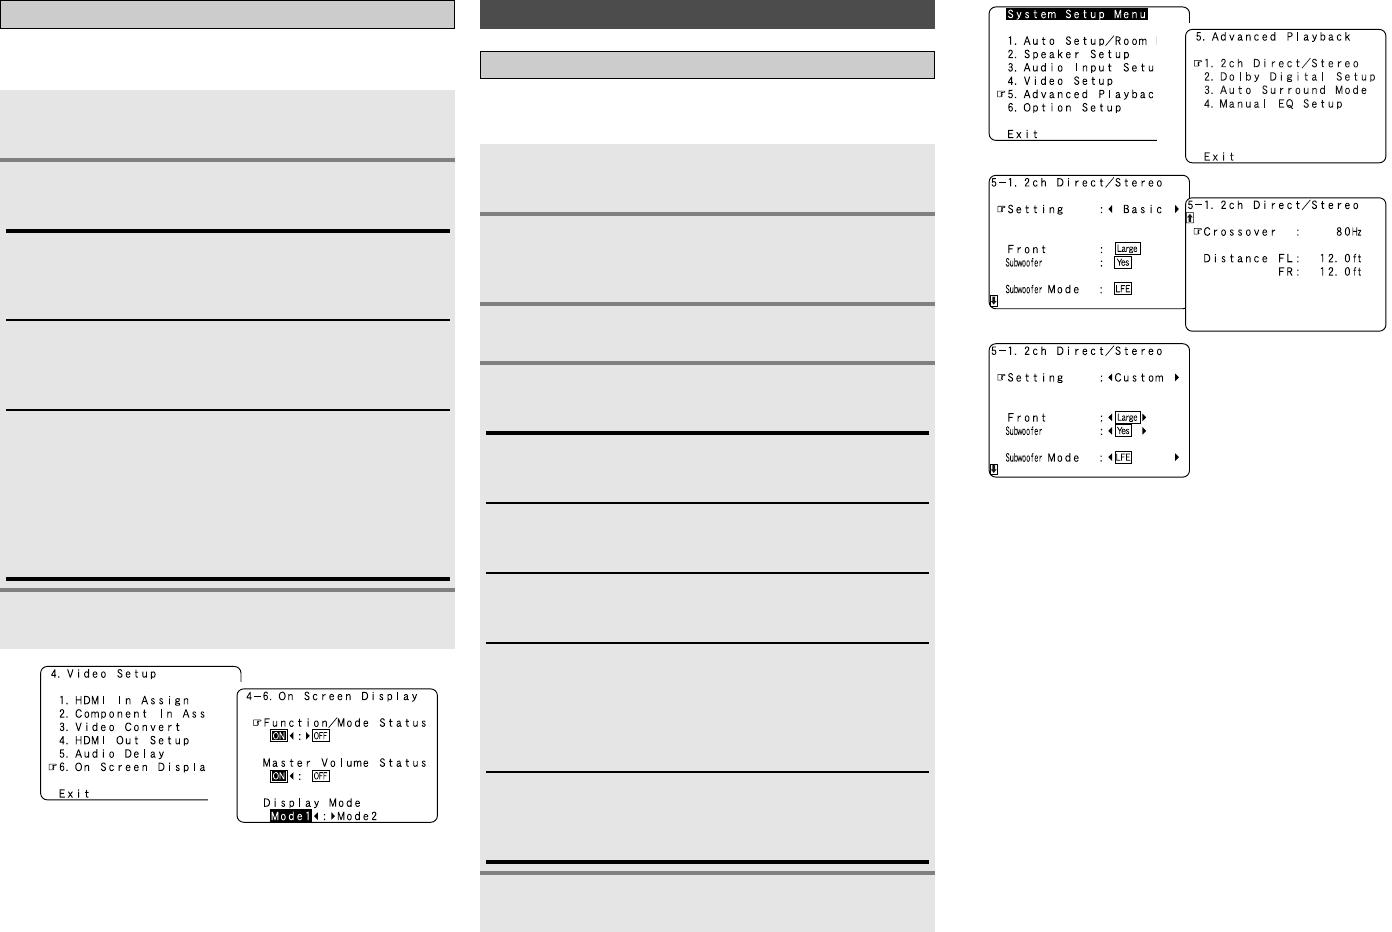 Handleiding Denon AVR-2807 (pagina 56 van 88) (English)